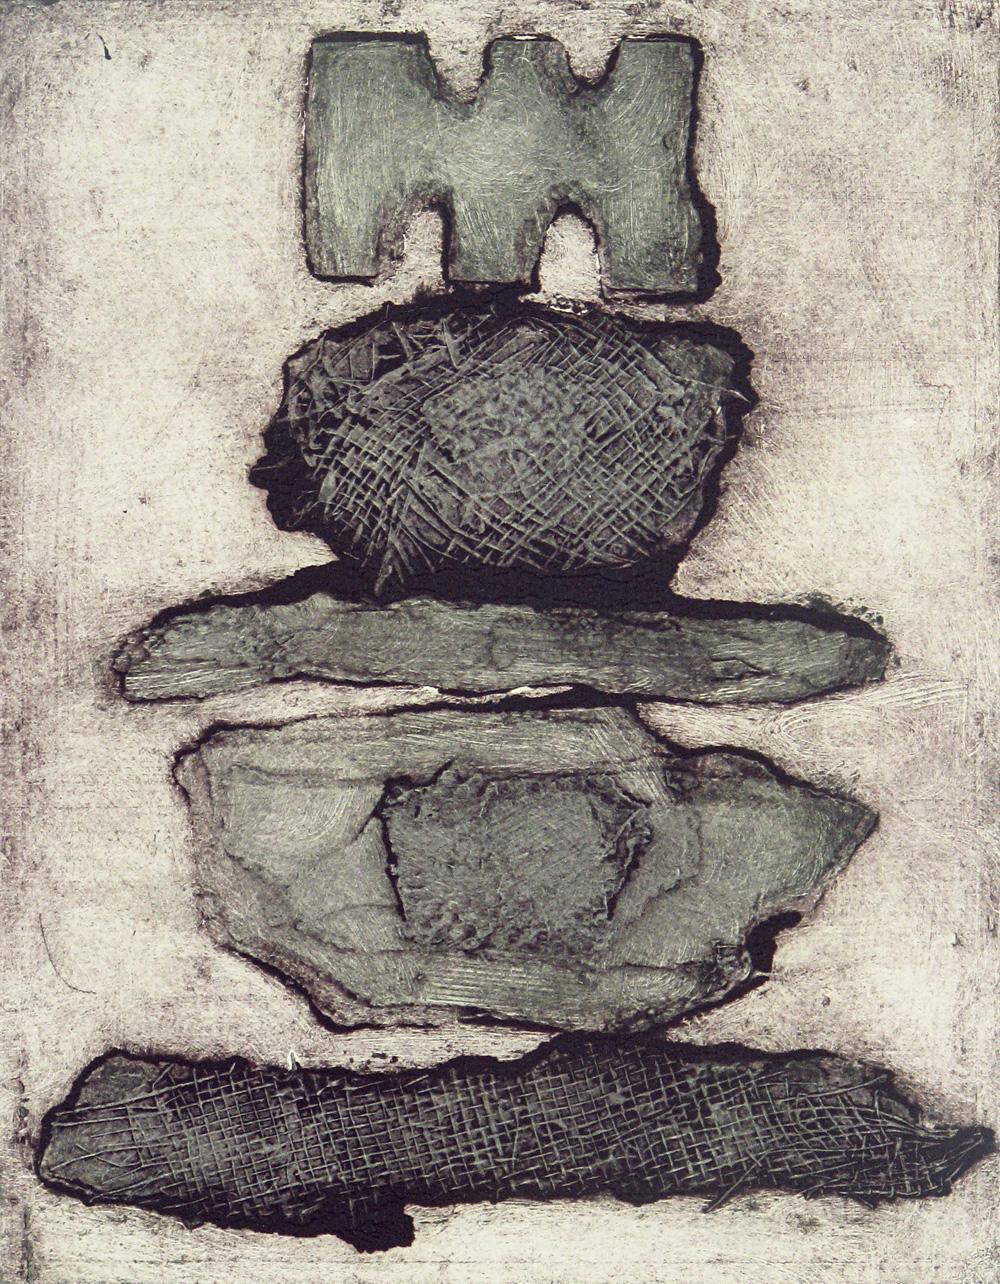 Prima Materia III by Renee Iacone